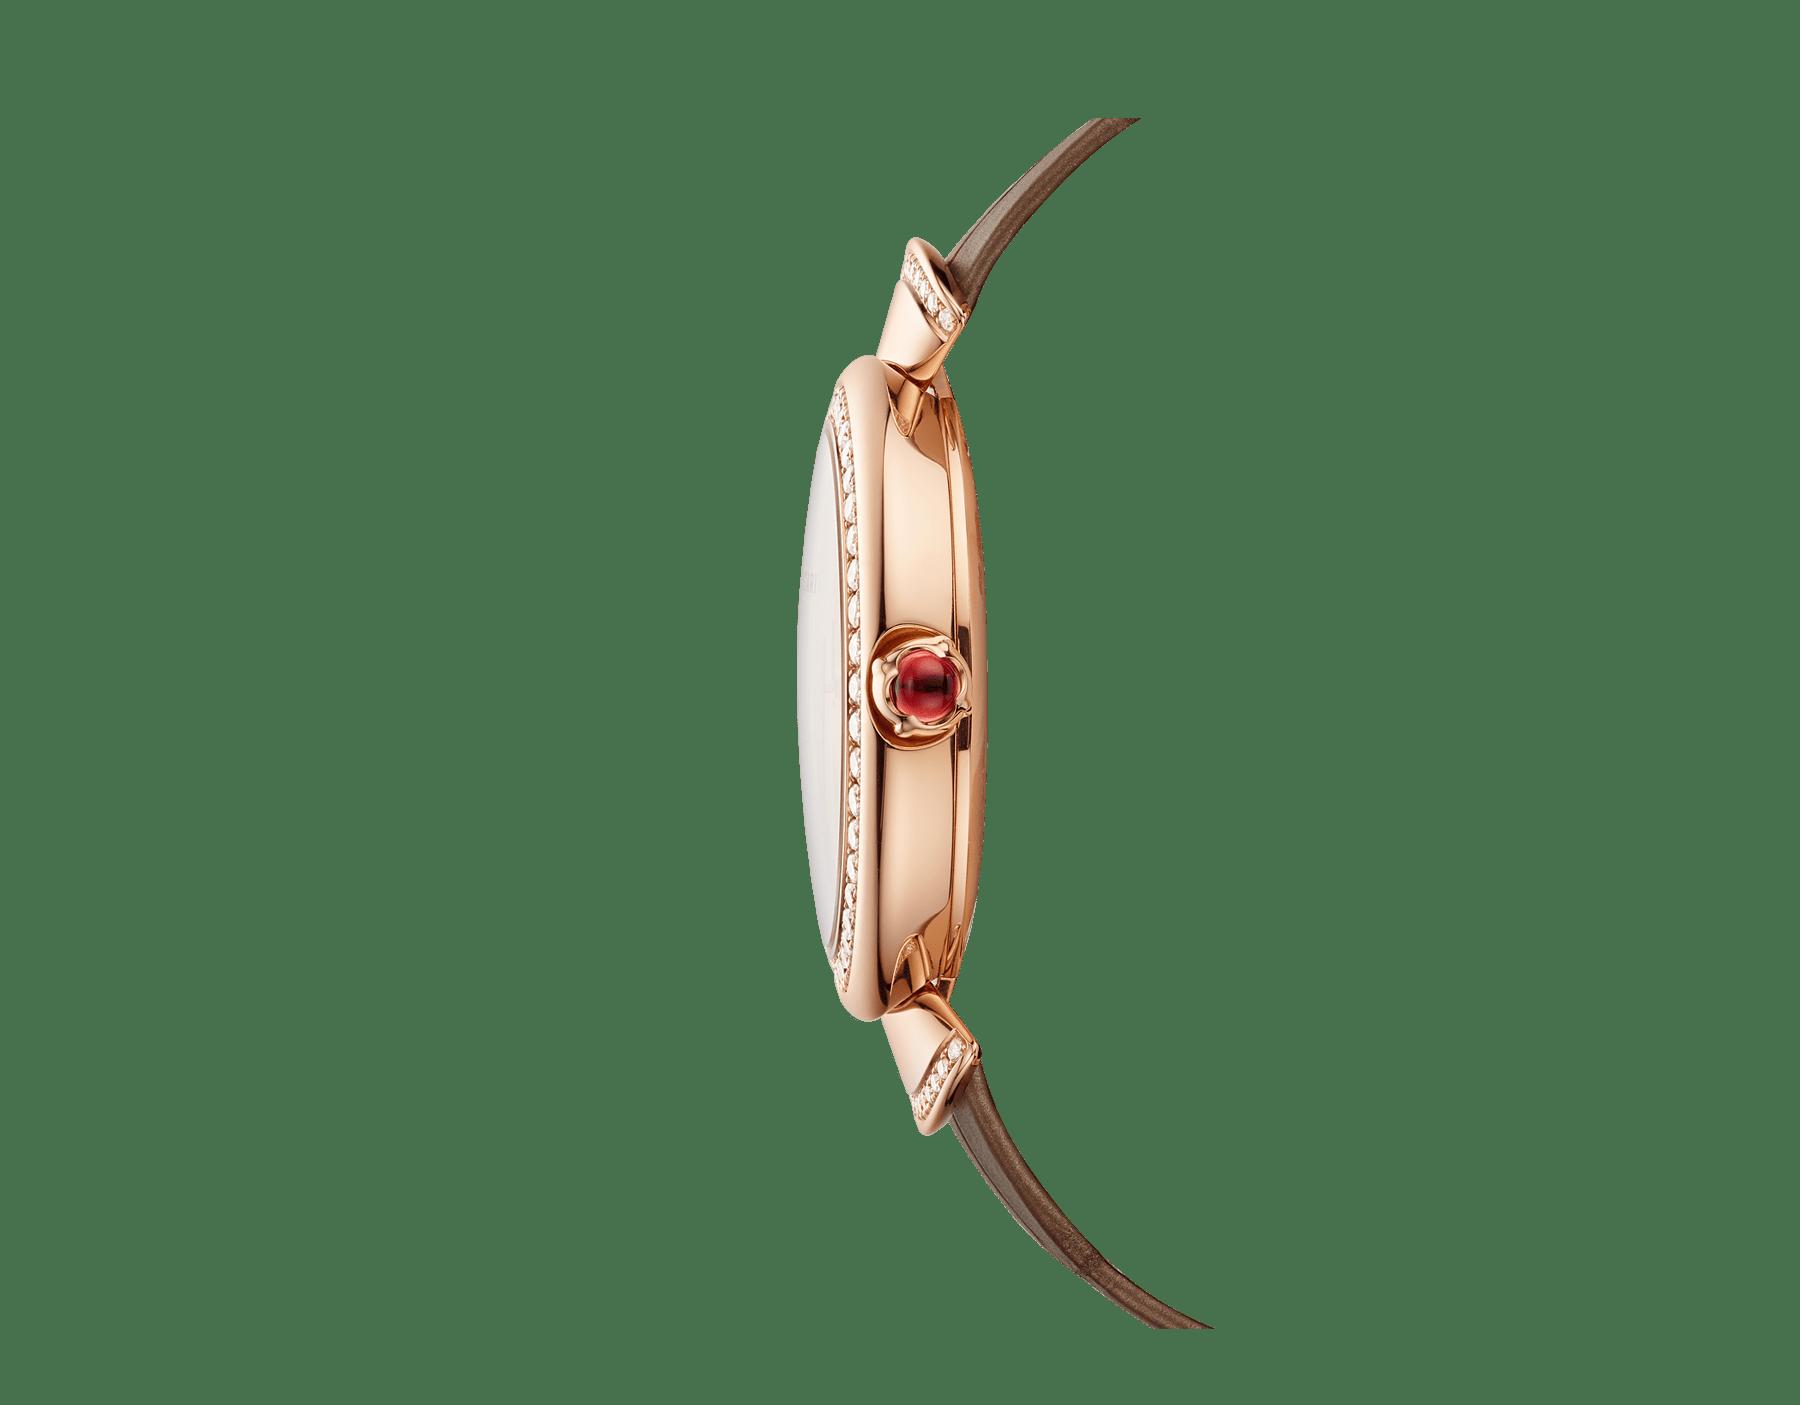 DIVAS' DREAM腕表,搭载品牌自制自动上链机械机芯,18K玫瑰金表壳,18K玫瑰金表圈和扇形链节,皆镶嵌明亮式切割钻石,天然孔雀羽毛表盘和闪亮米色鳄鱼皮表带 103139 image 3